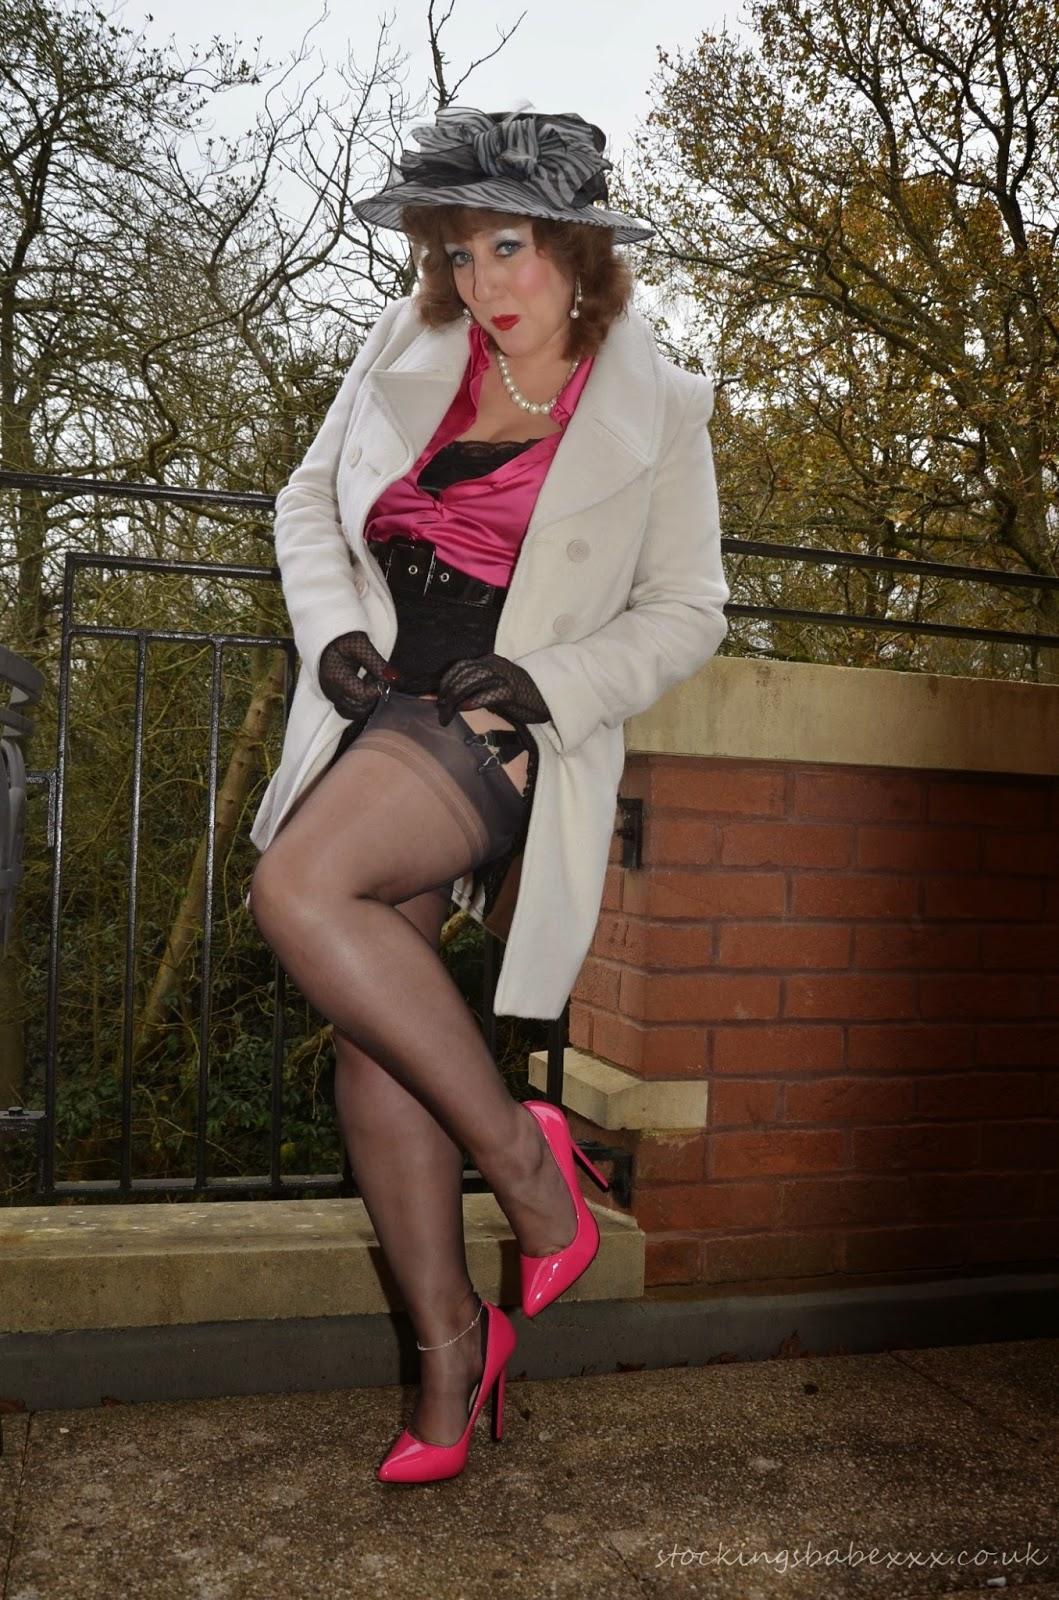 Julie Stockings Babe Julie Aka Stockings Babe Julie For Stockings Babe Gal Full